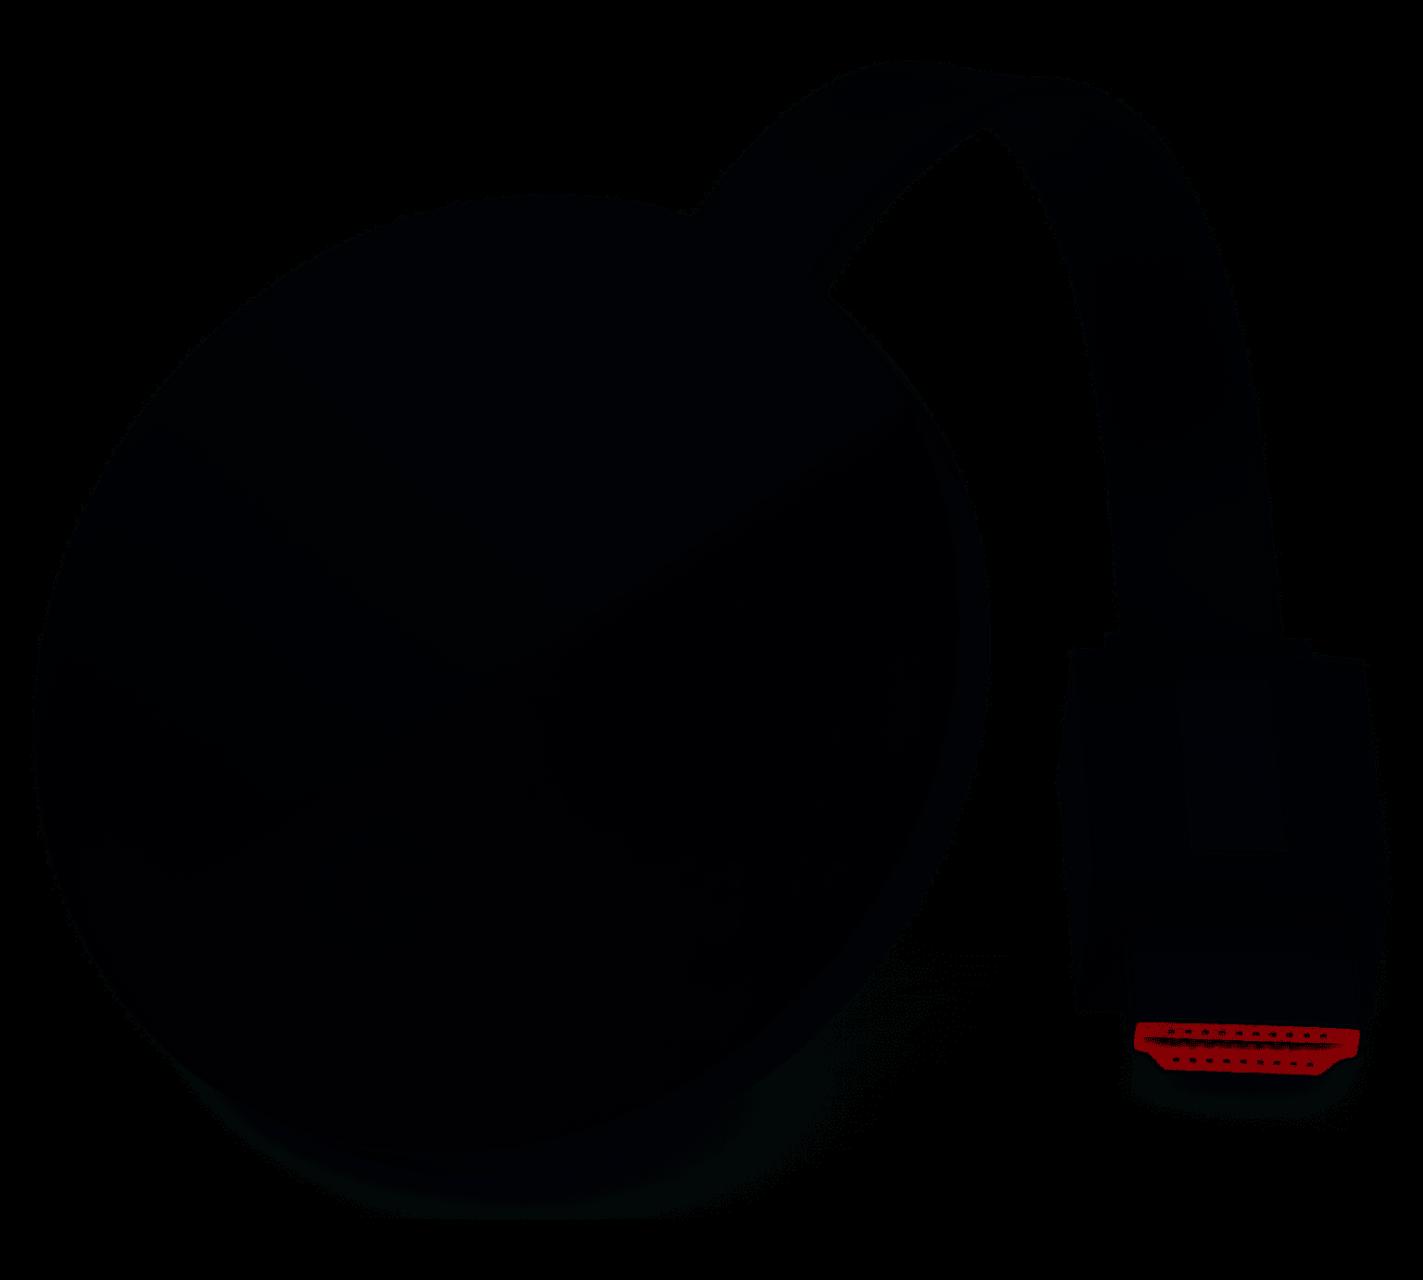 Google Chomecast Ultra